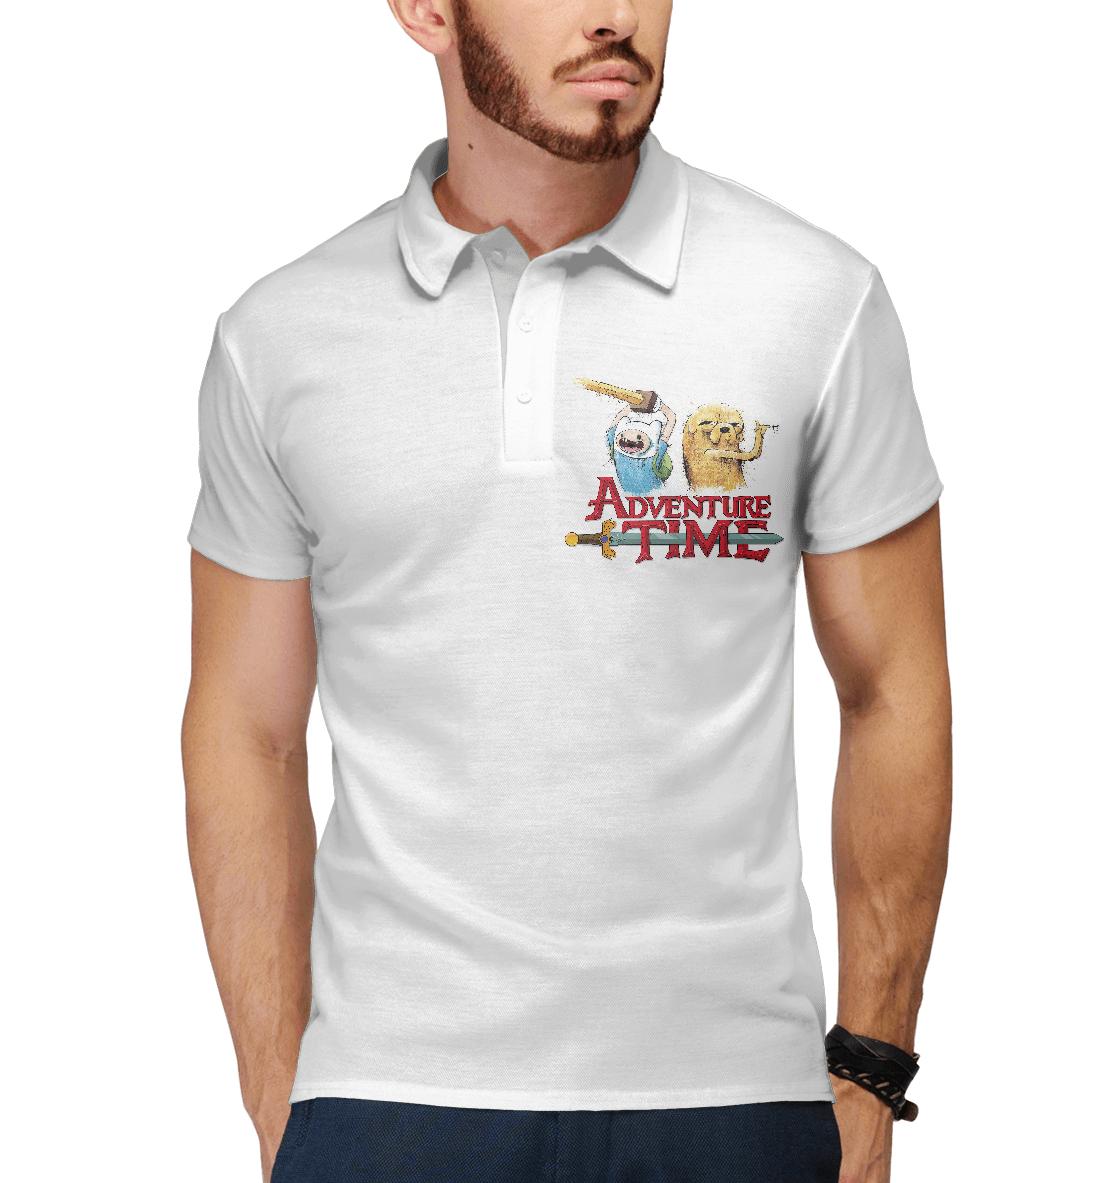 Купить Adventure Time Finn and Jake, Printbar, Поло, ADV-109309-pol-2